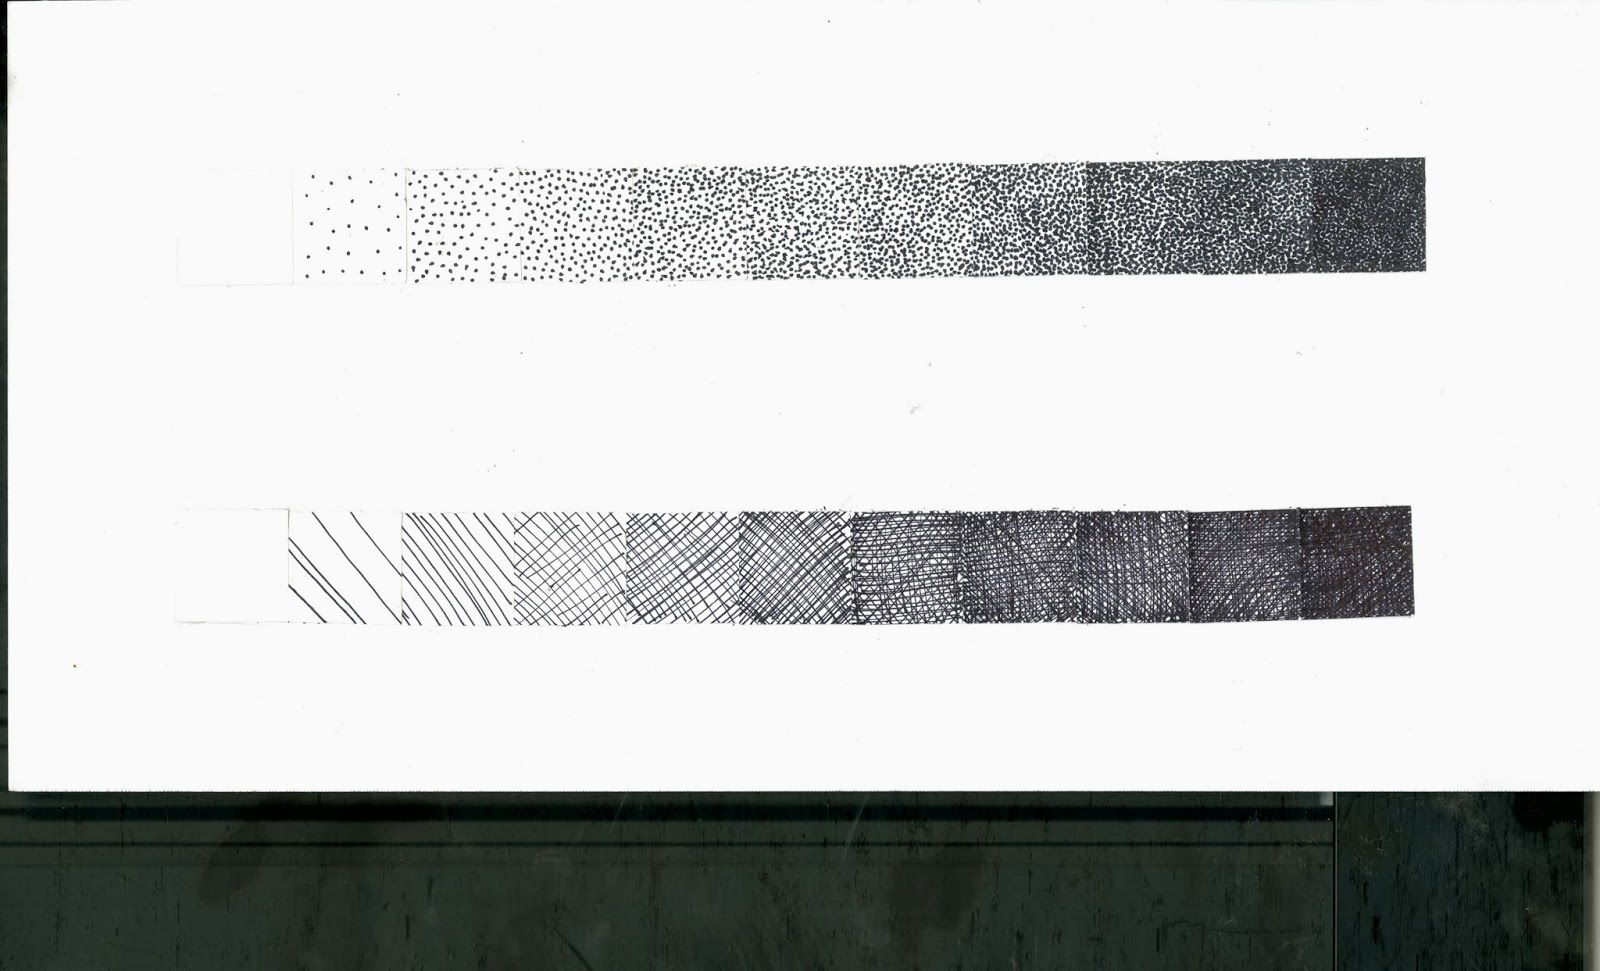 Erinkeenandesign Textured Value Scale